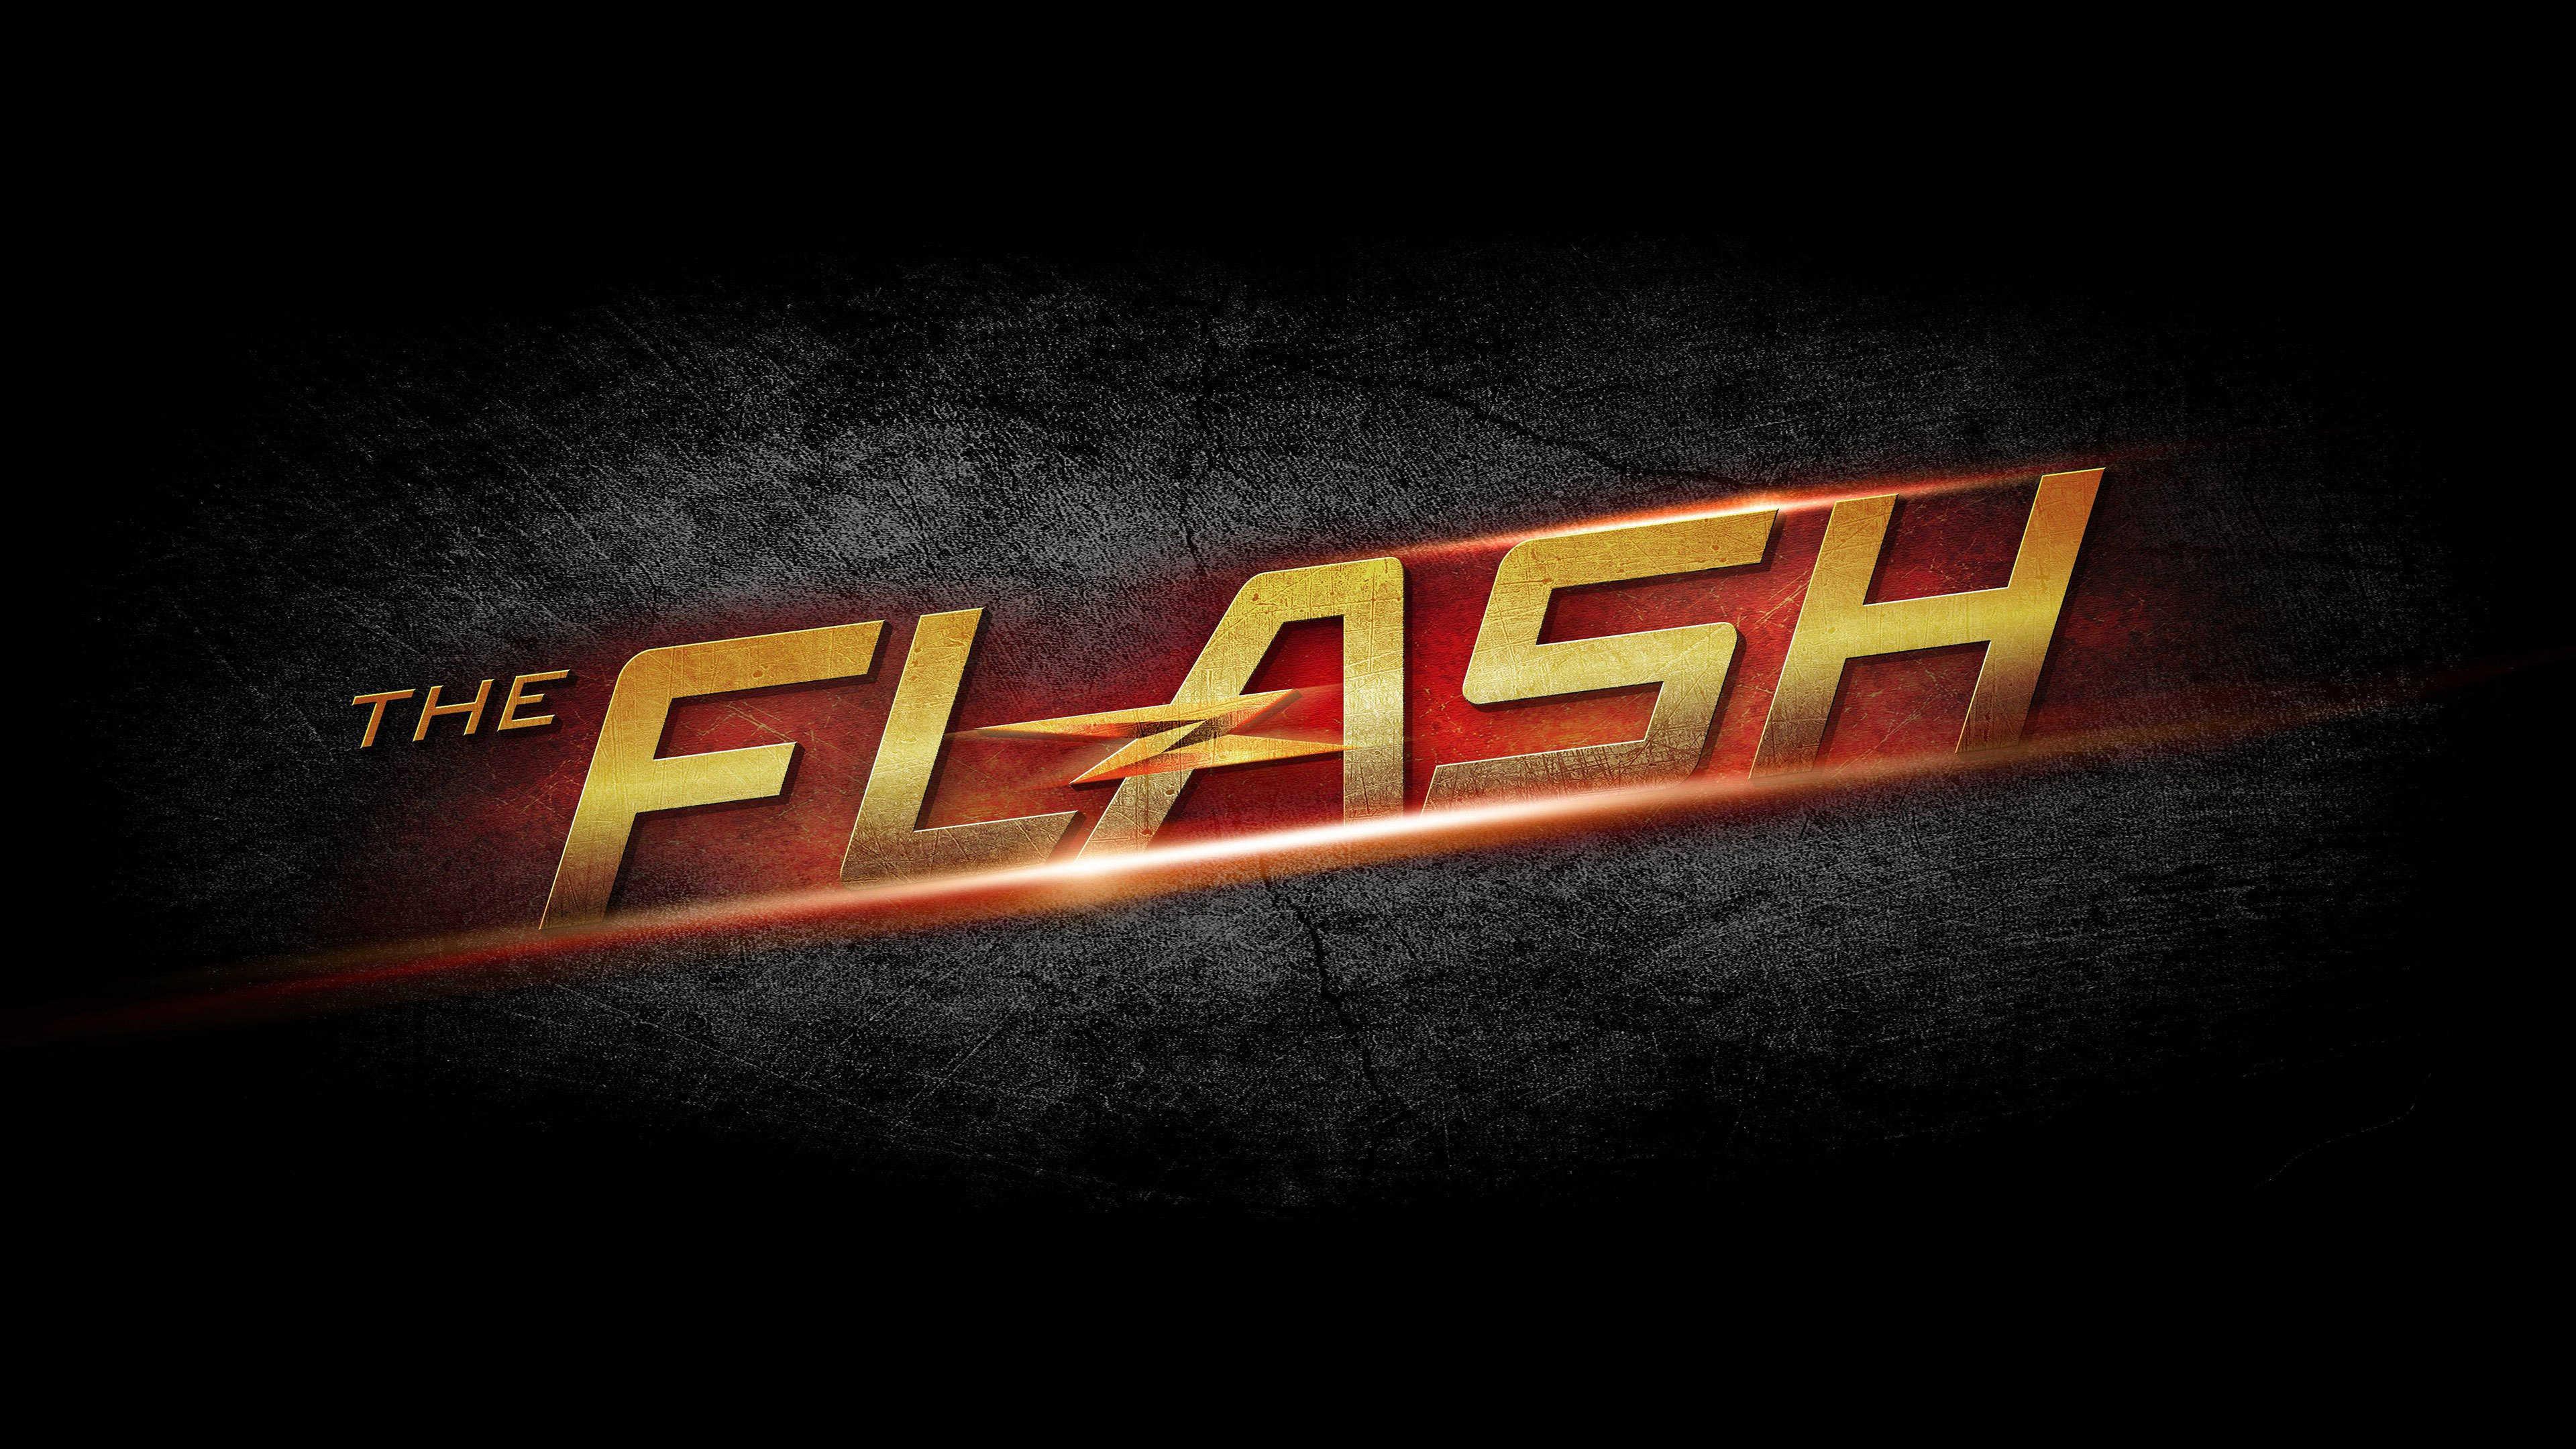 Download The Flash Logo Desktop Wallpaper hdwallwidecom HDWallWide 3840x2160